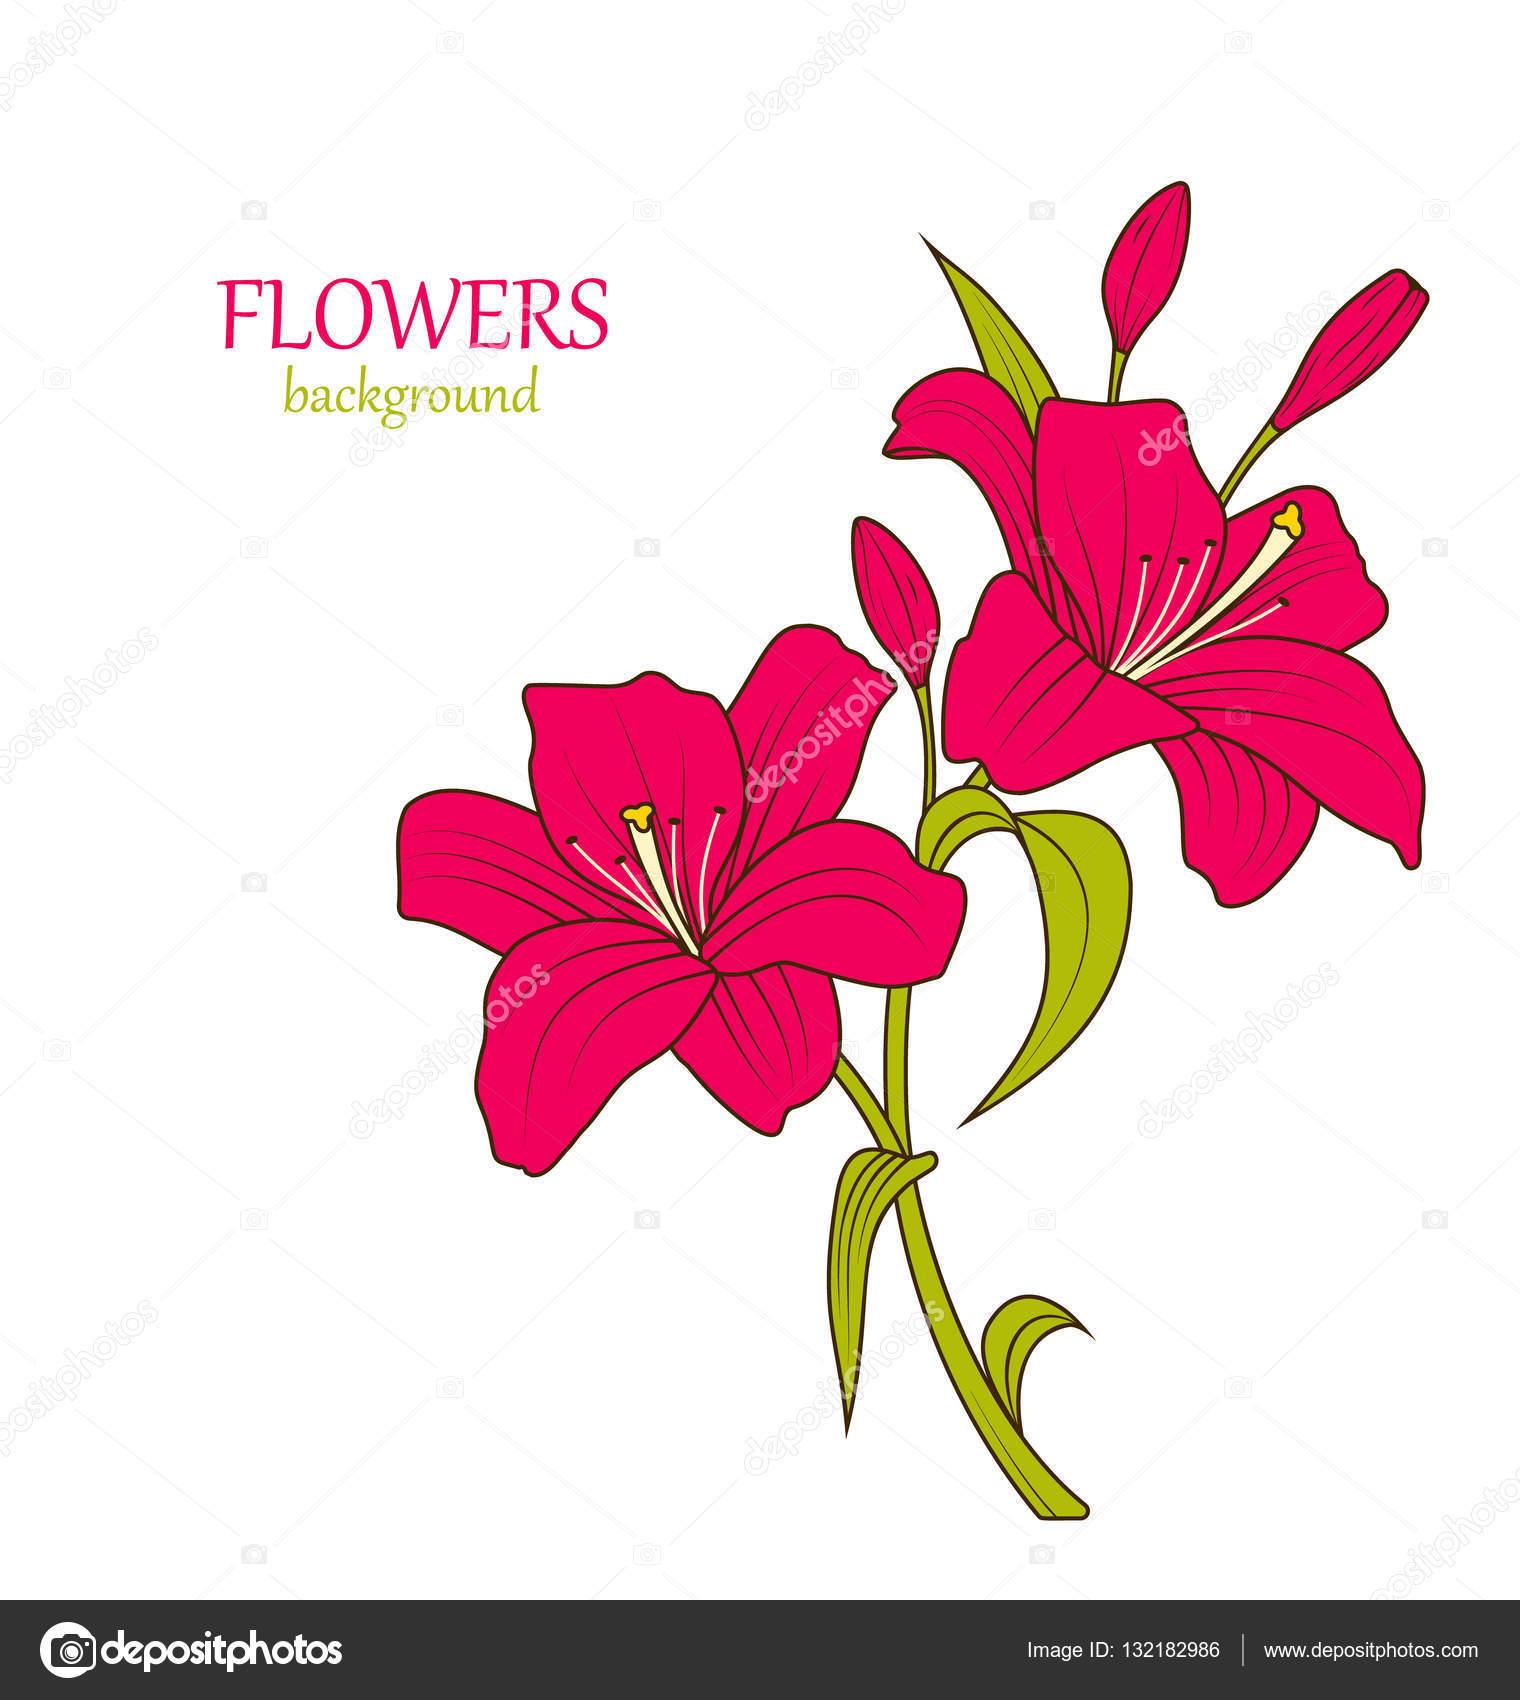 Dibujo Lineal Color De Flores Hermoso Lirio Aislado Fotos De Stock